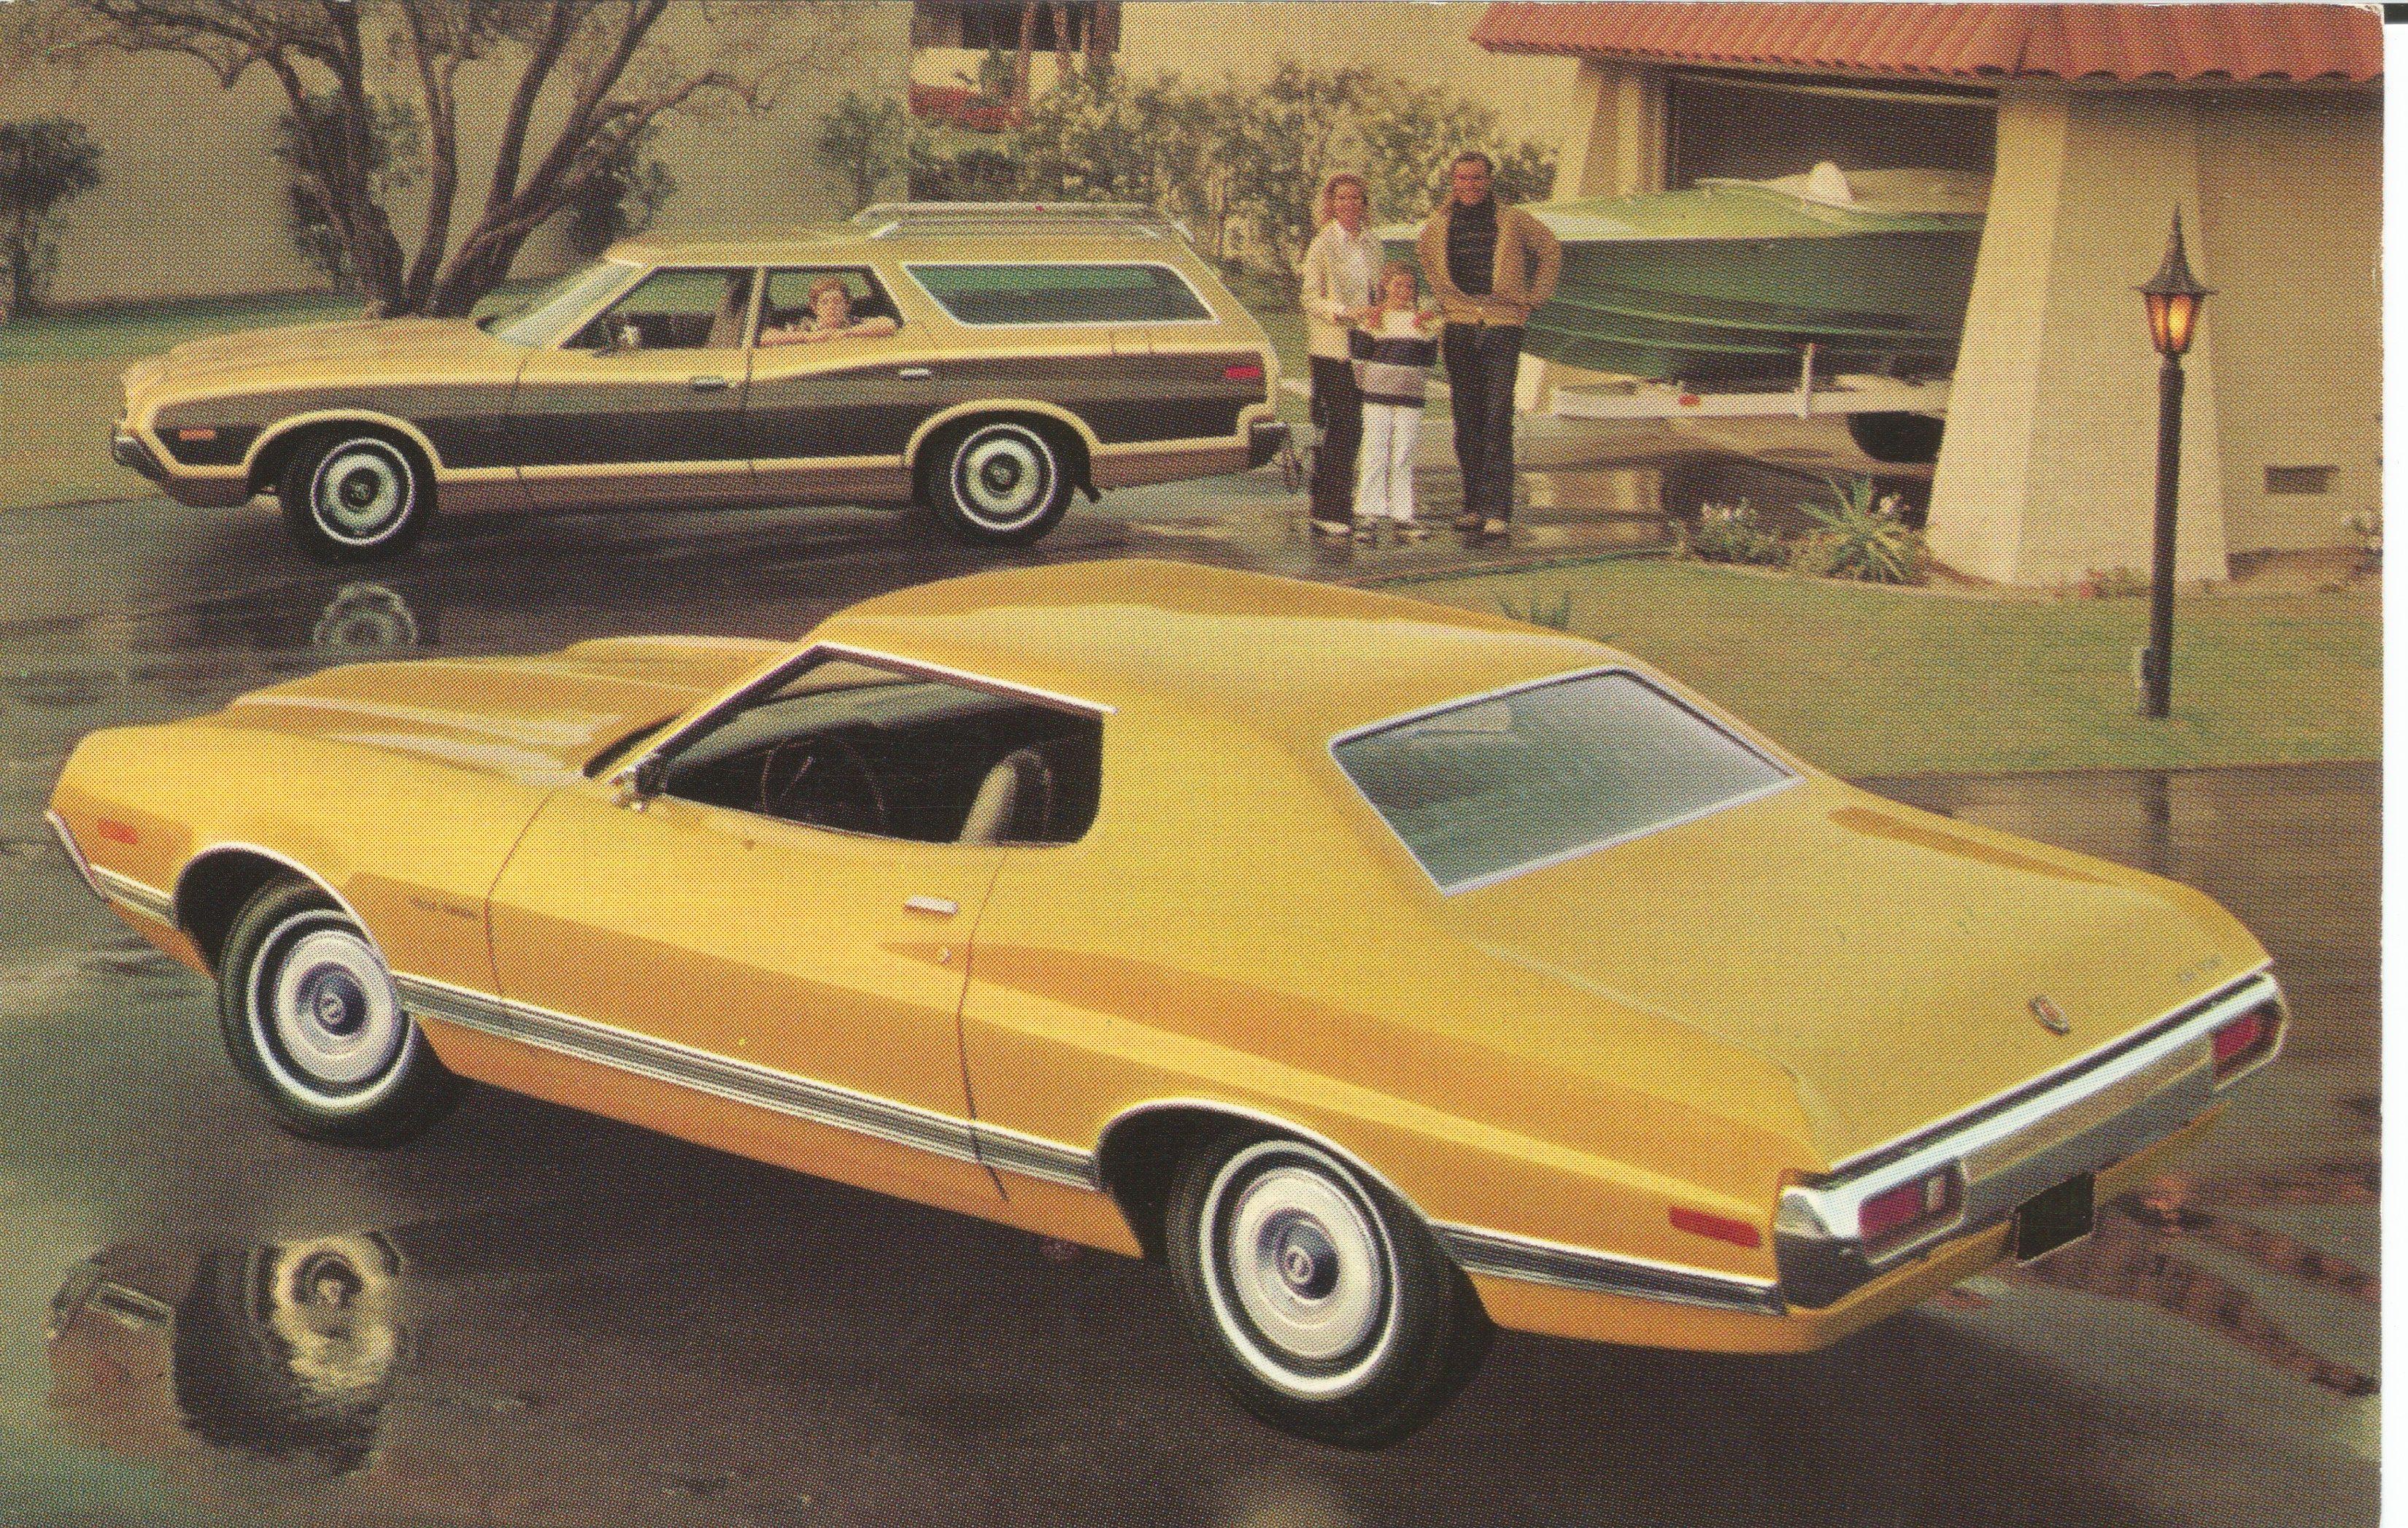 1972 Ford Gran Torino 2 Door Hardtop Formal 1972 Gran Torino Squire Station Wagon Ford Torino Ford Motor Ford